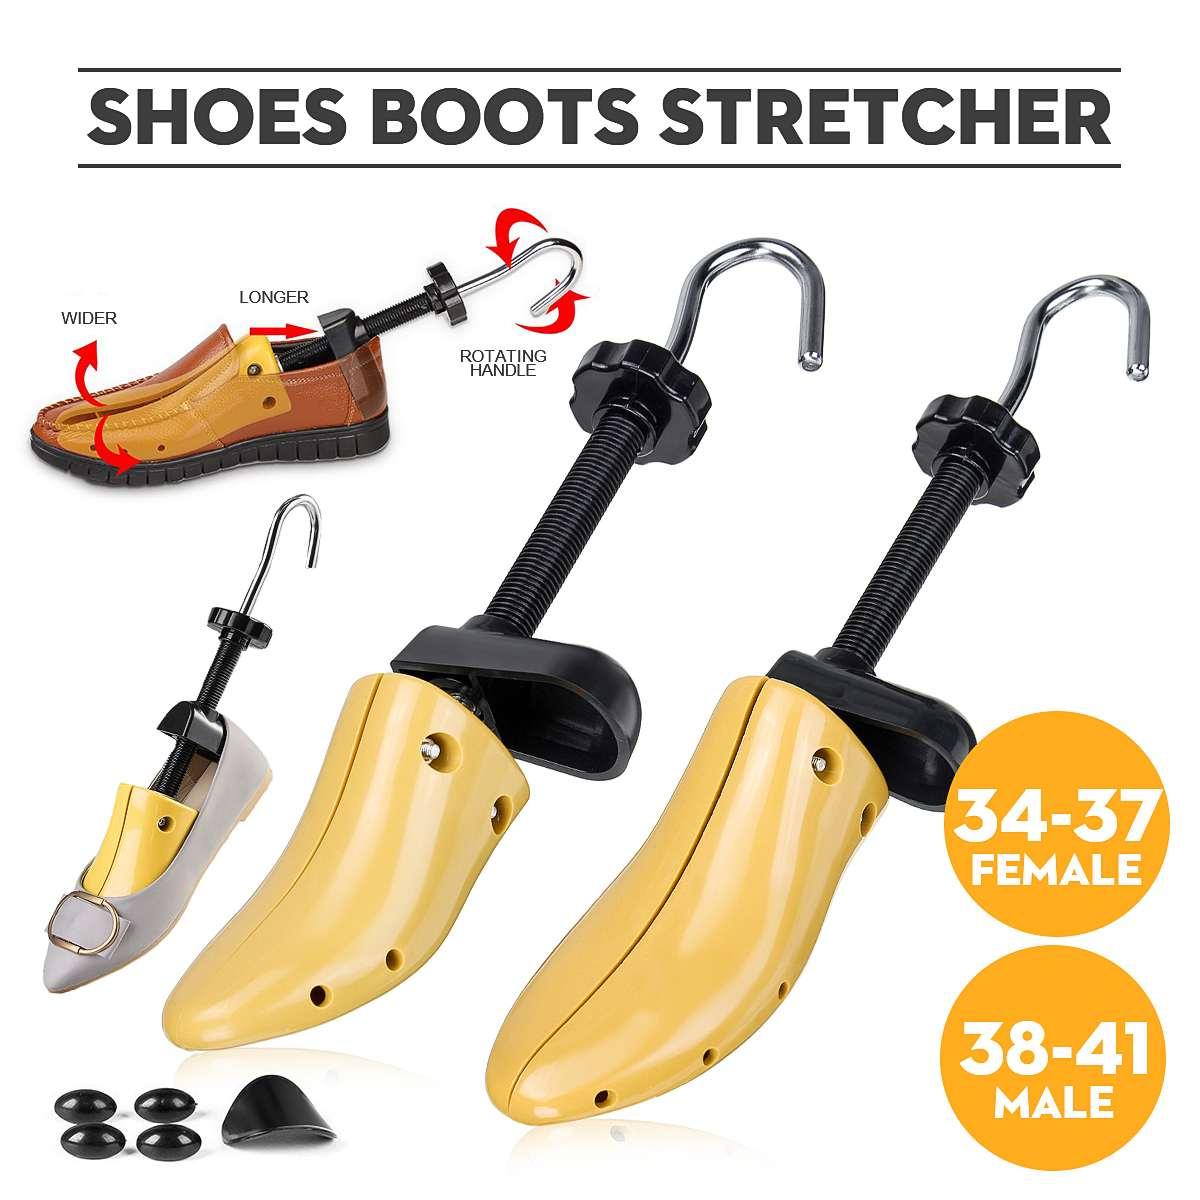 1 Piece Shoe Trees Wood Shoes Stretcher Wooden Adjustable Man Women Flats Pumps Boot Shaper Rack Expander Trees Size 34-41